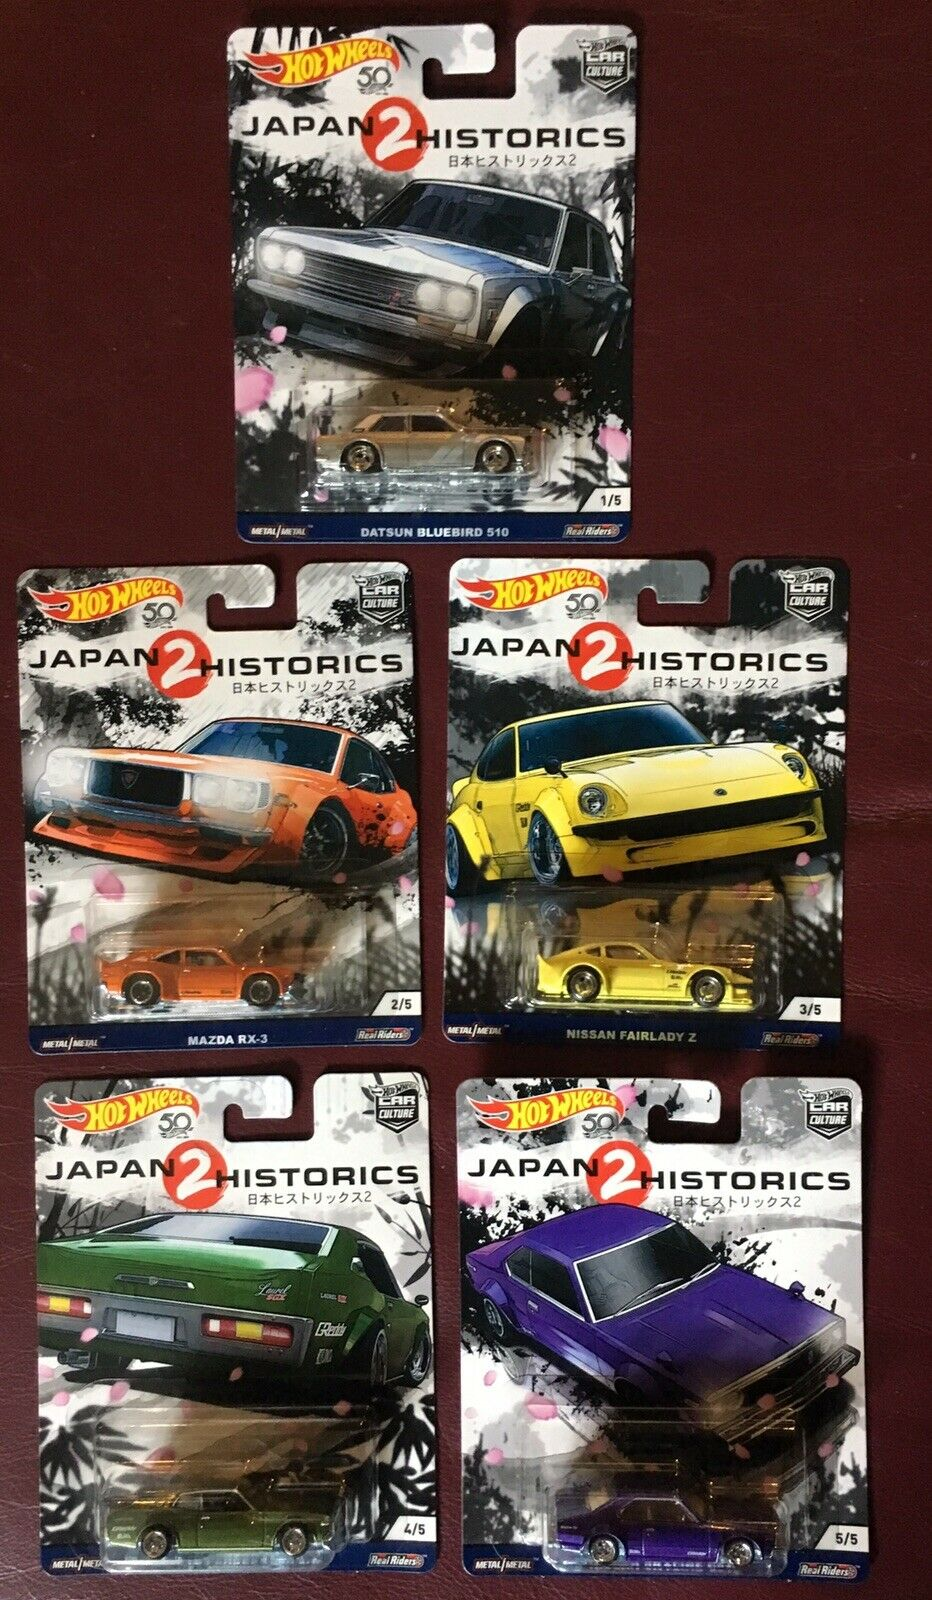 Hot Wheels Japanese Historics 2 Set VHTF Datsun blueebird Skyline Laurel Fairlady